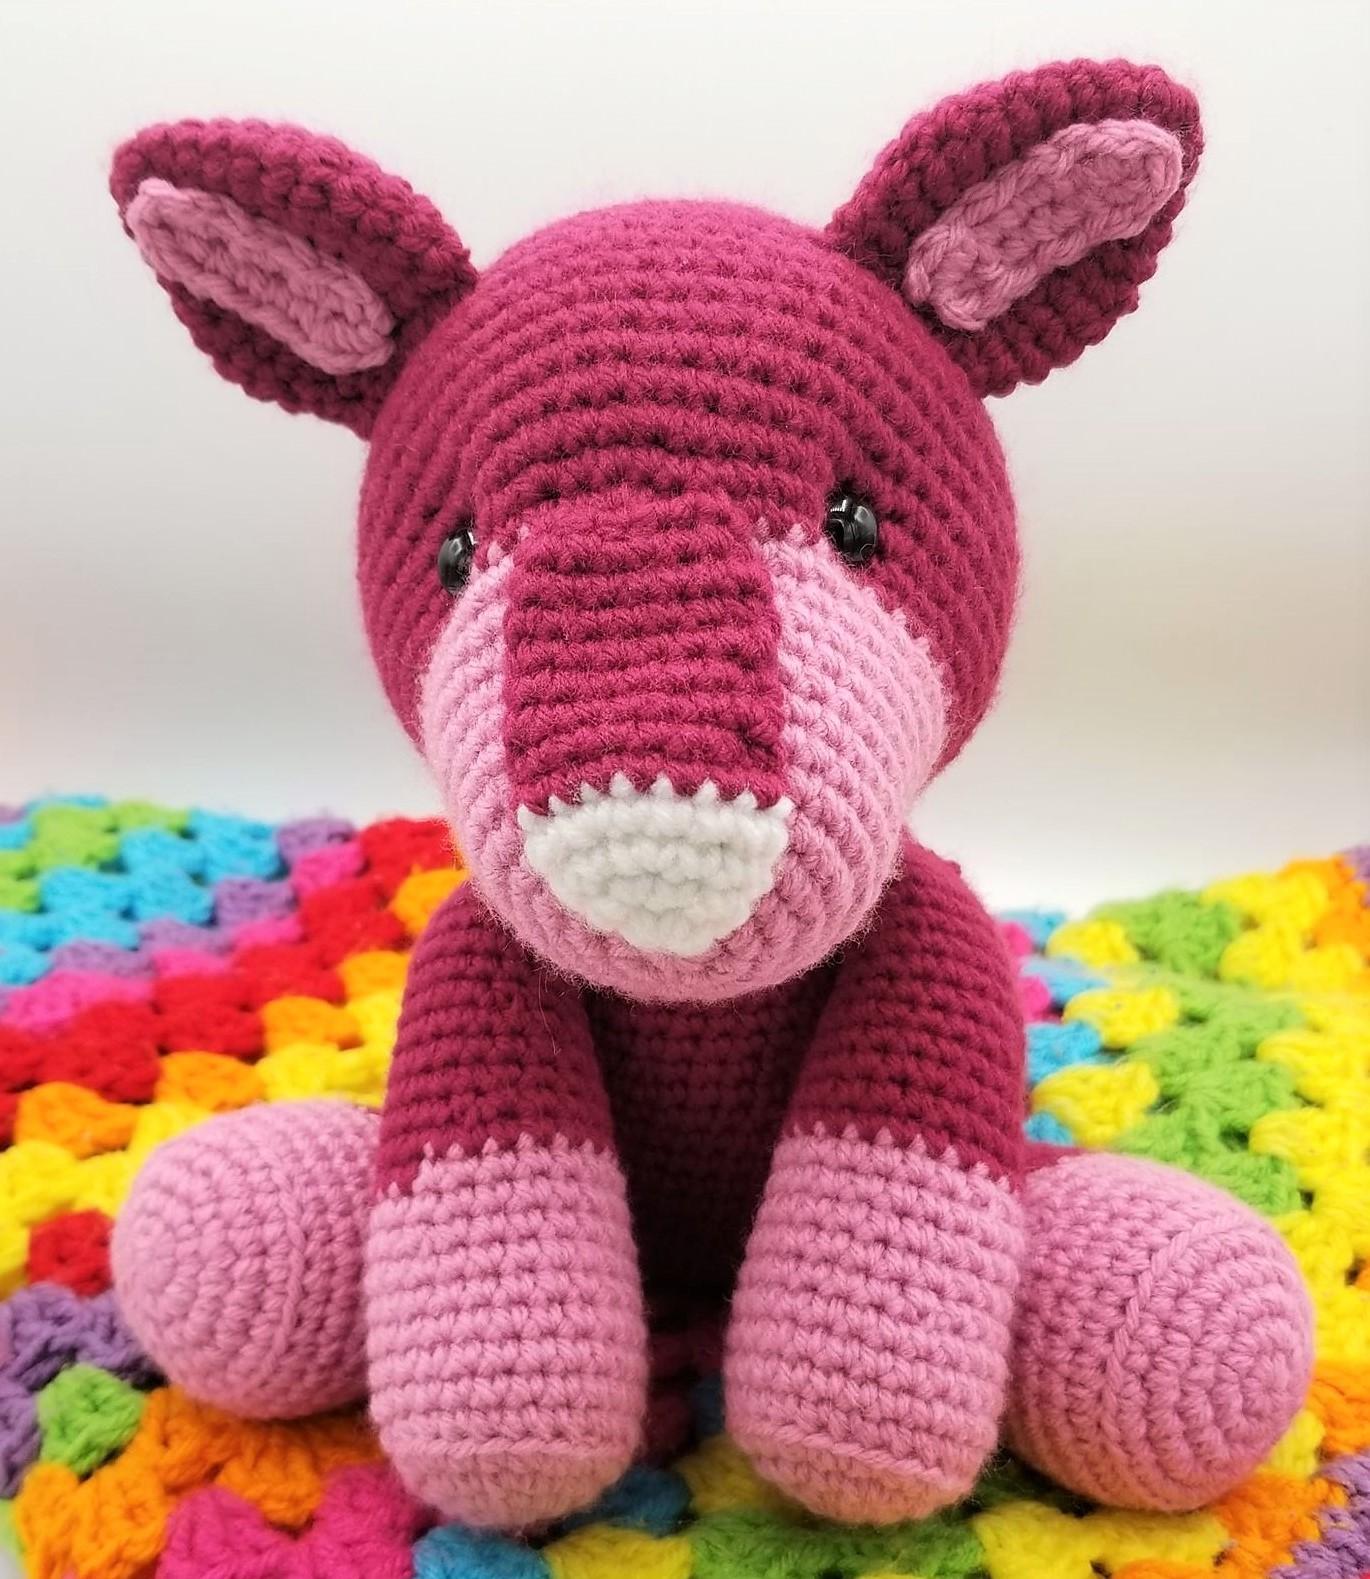 Crochet wolf amigurumi pattern - Amigurumi Today - Amigurumi ... | 1579x1370